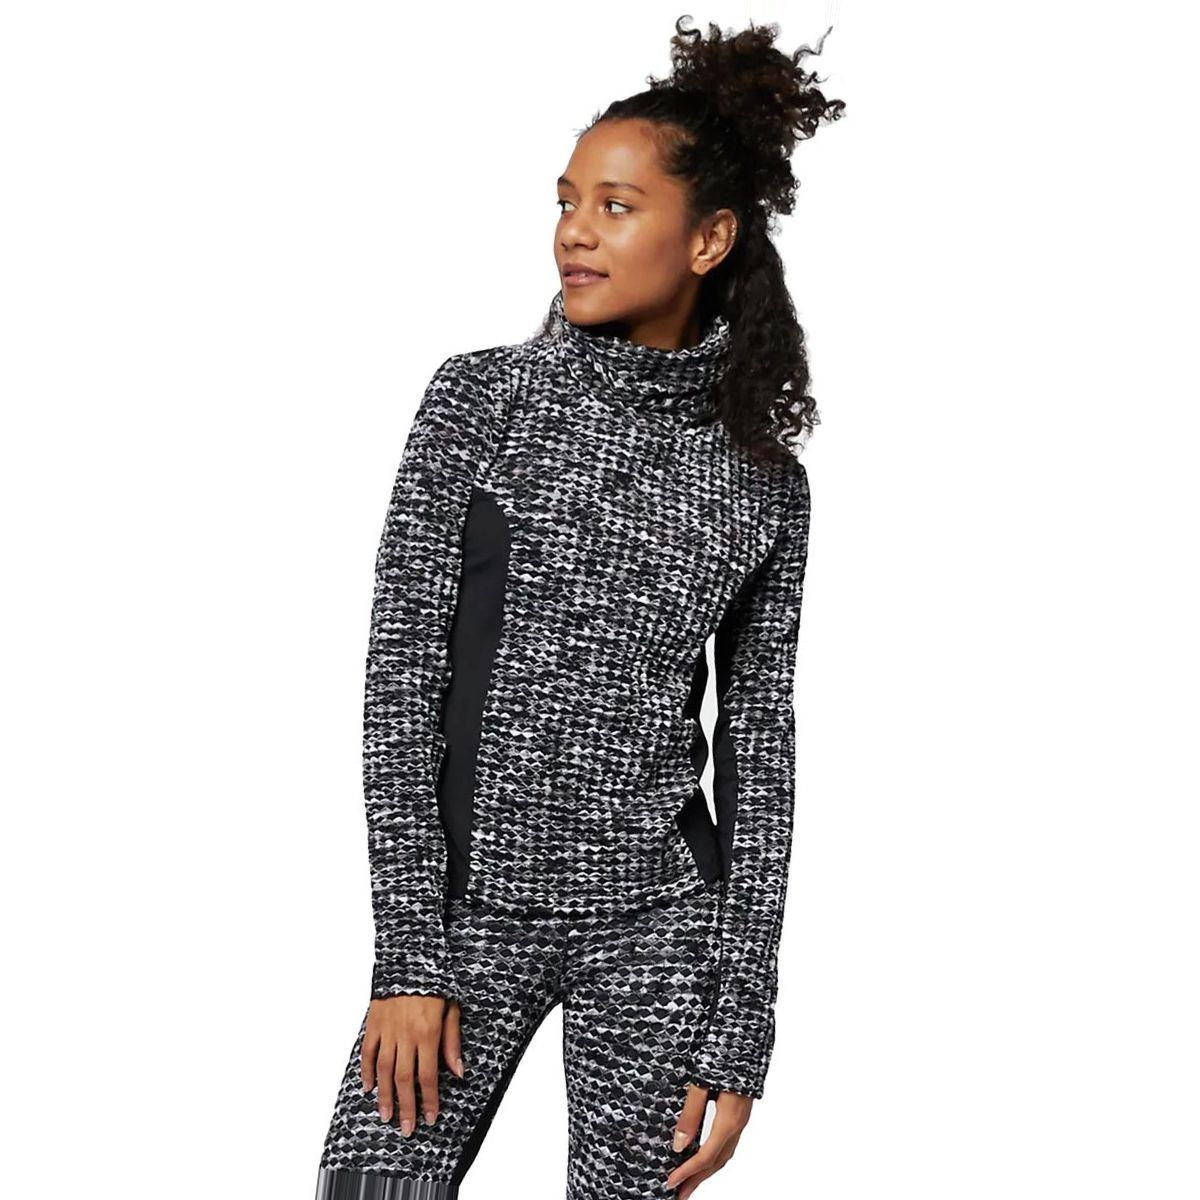 Nike Pro HyperWarm Long-Sleeve Brushed Top - Women's